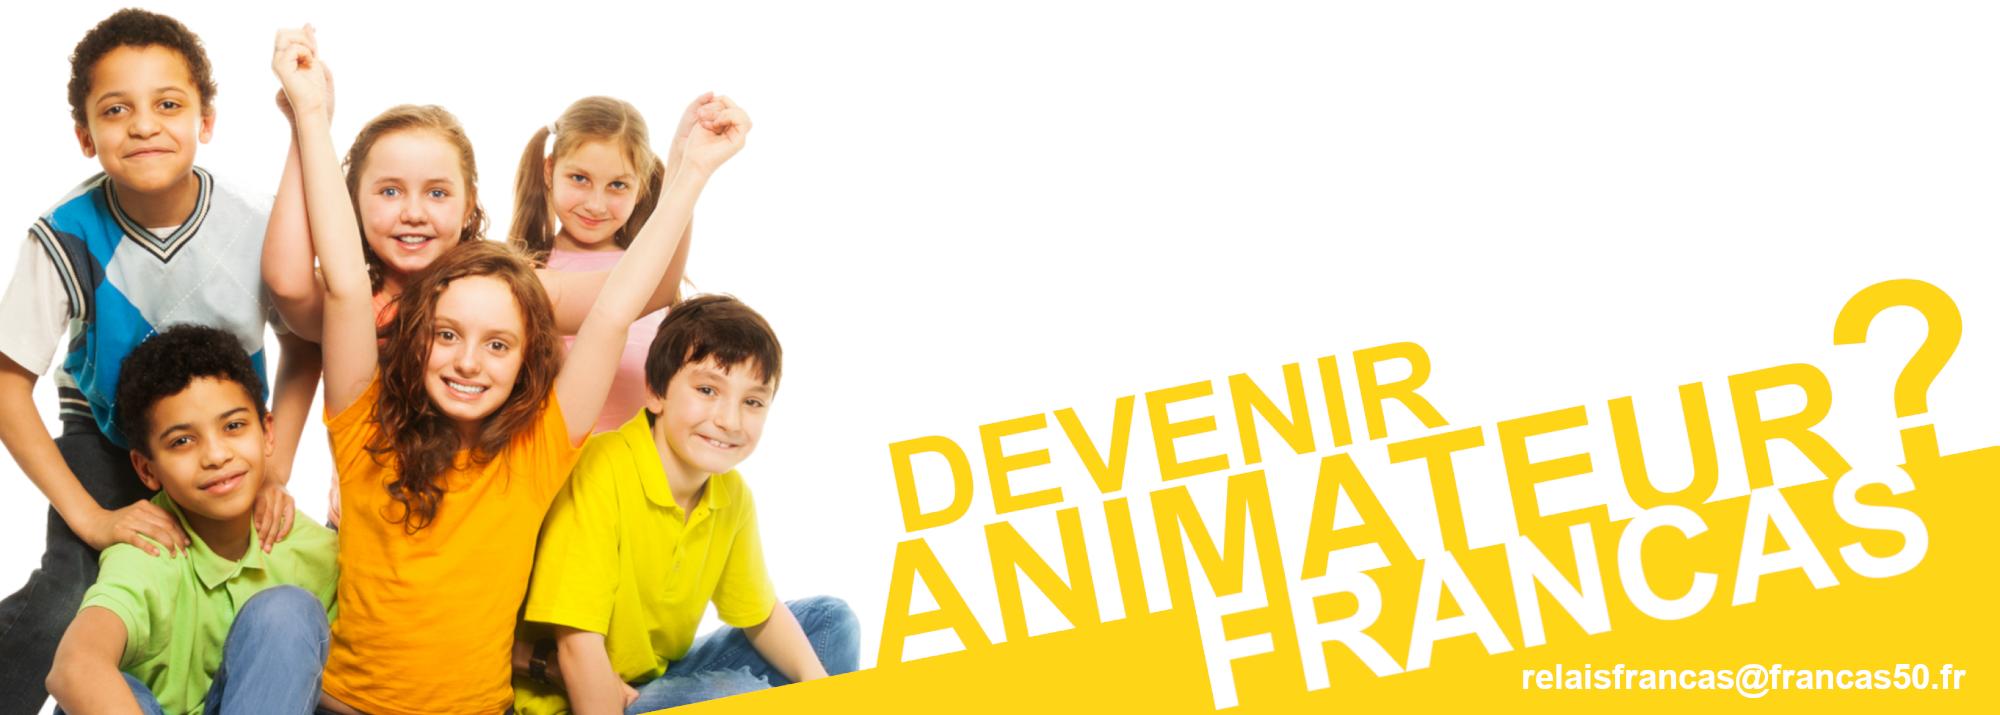 Recherche Animatrices/Animateurs